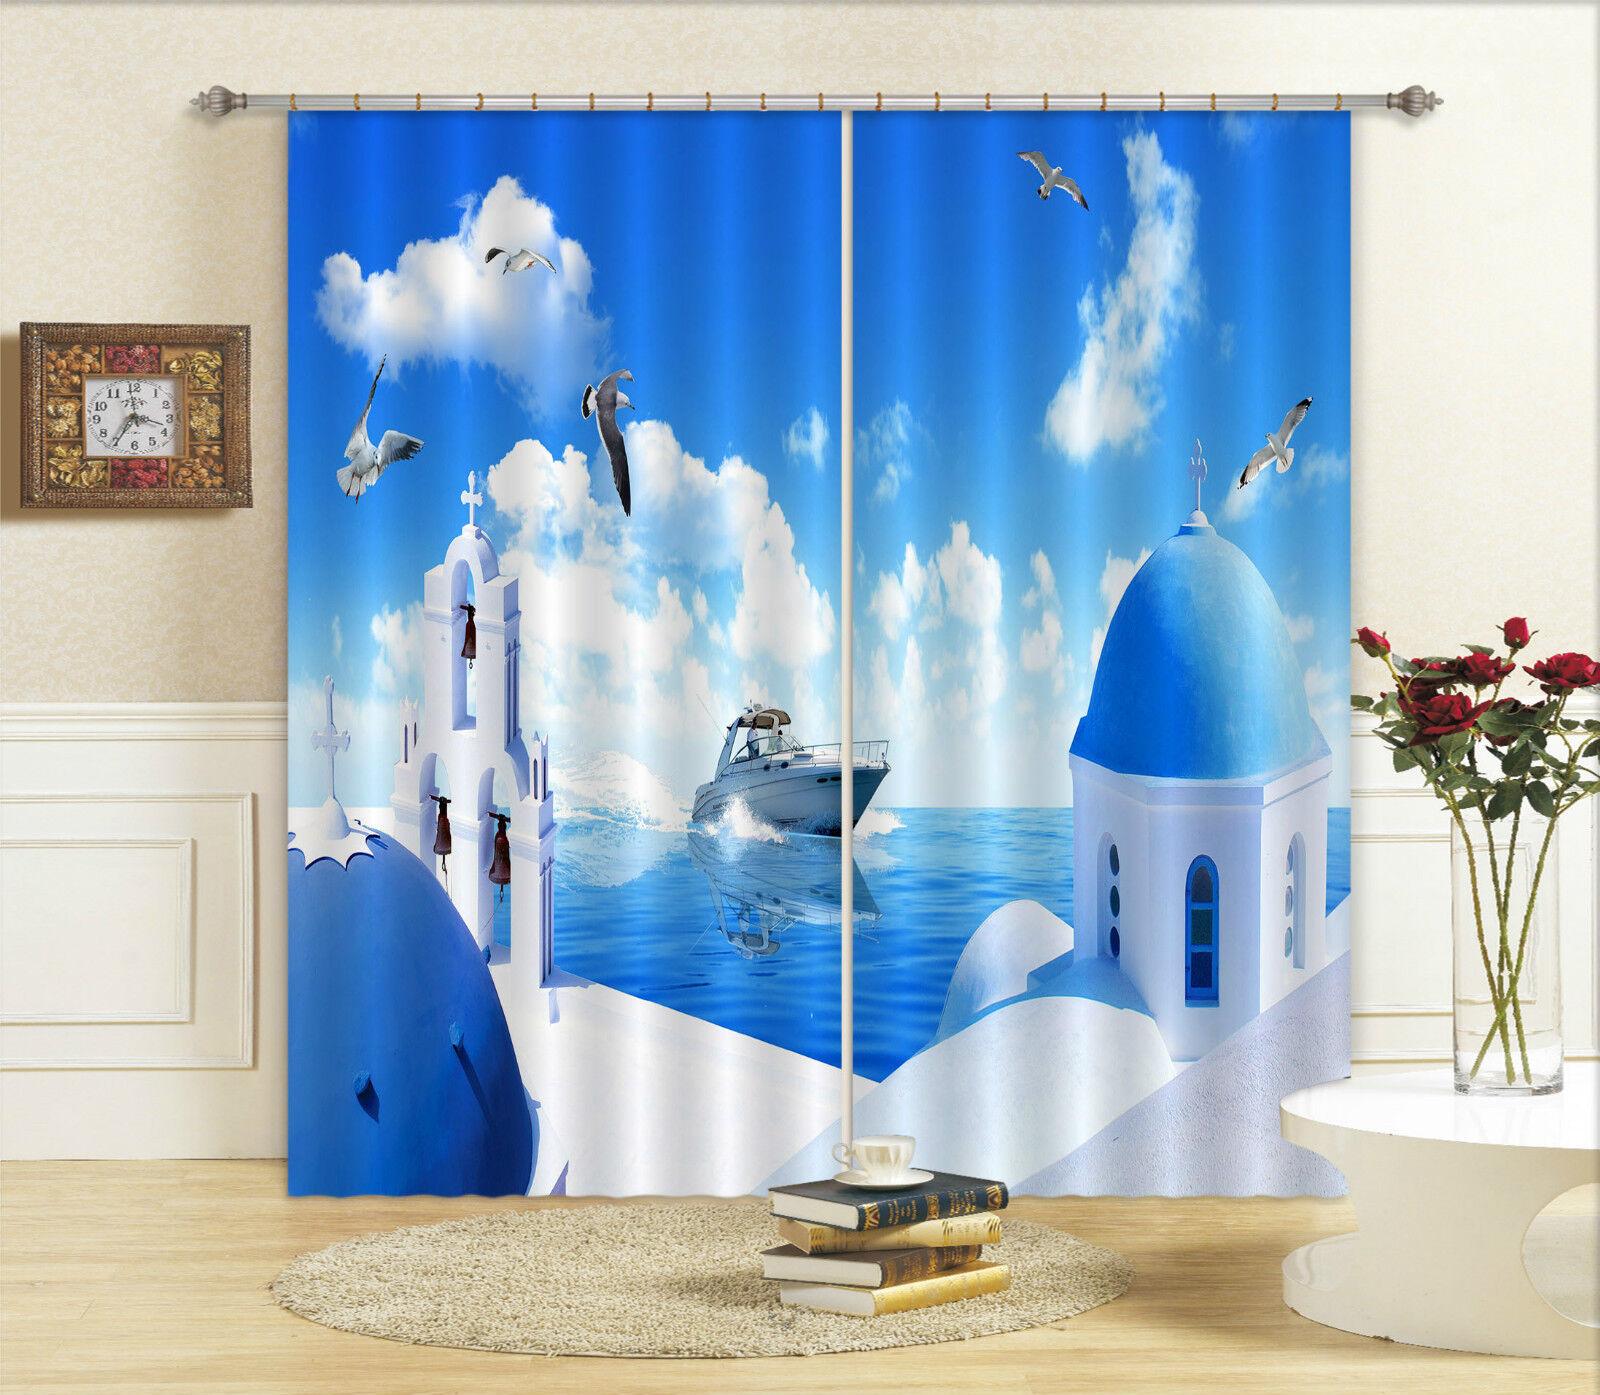 3d isla paisaje bloqueo foto cortina cortina de impresión sustancia cortinas de ventana